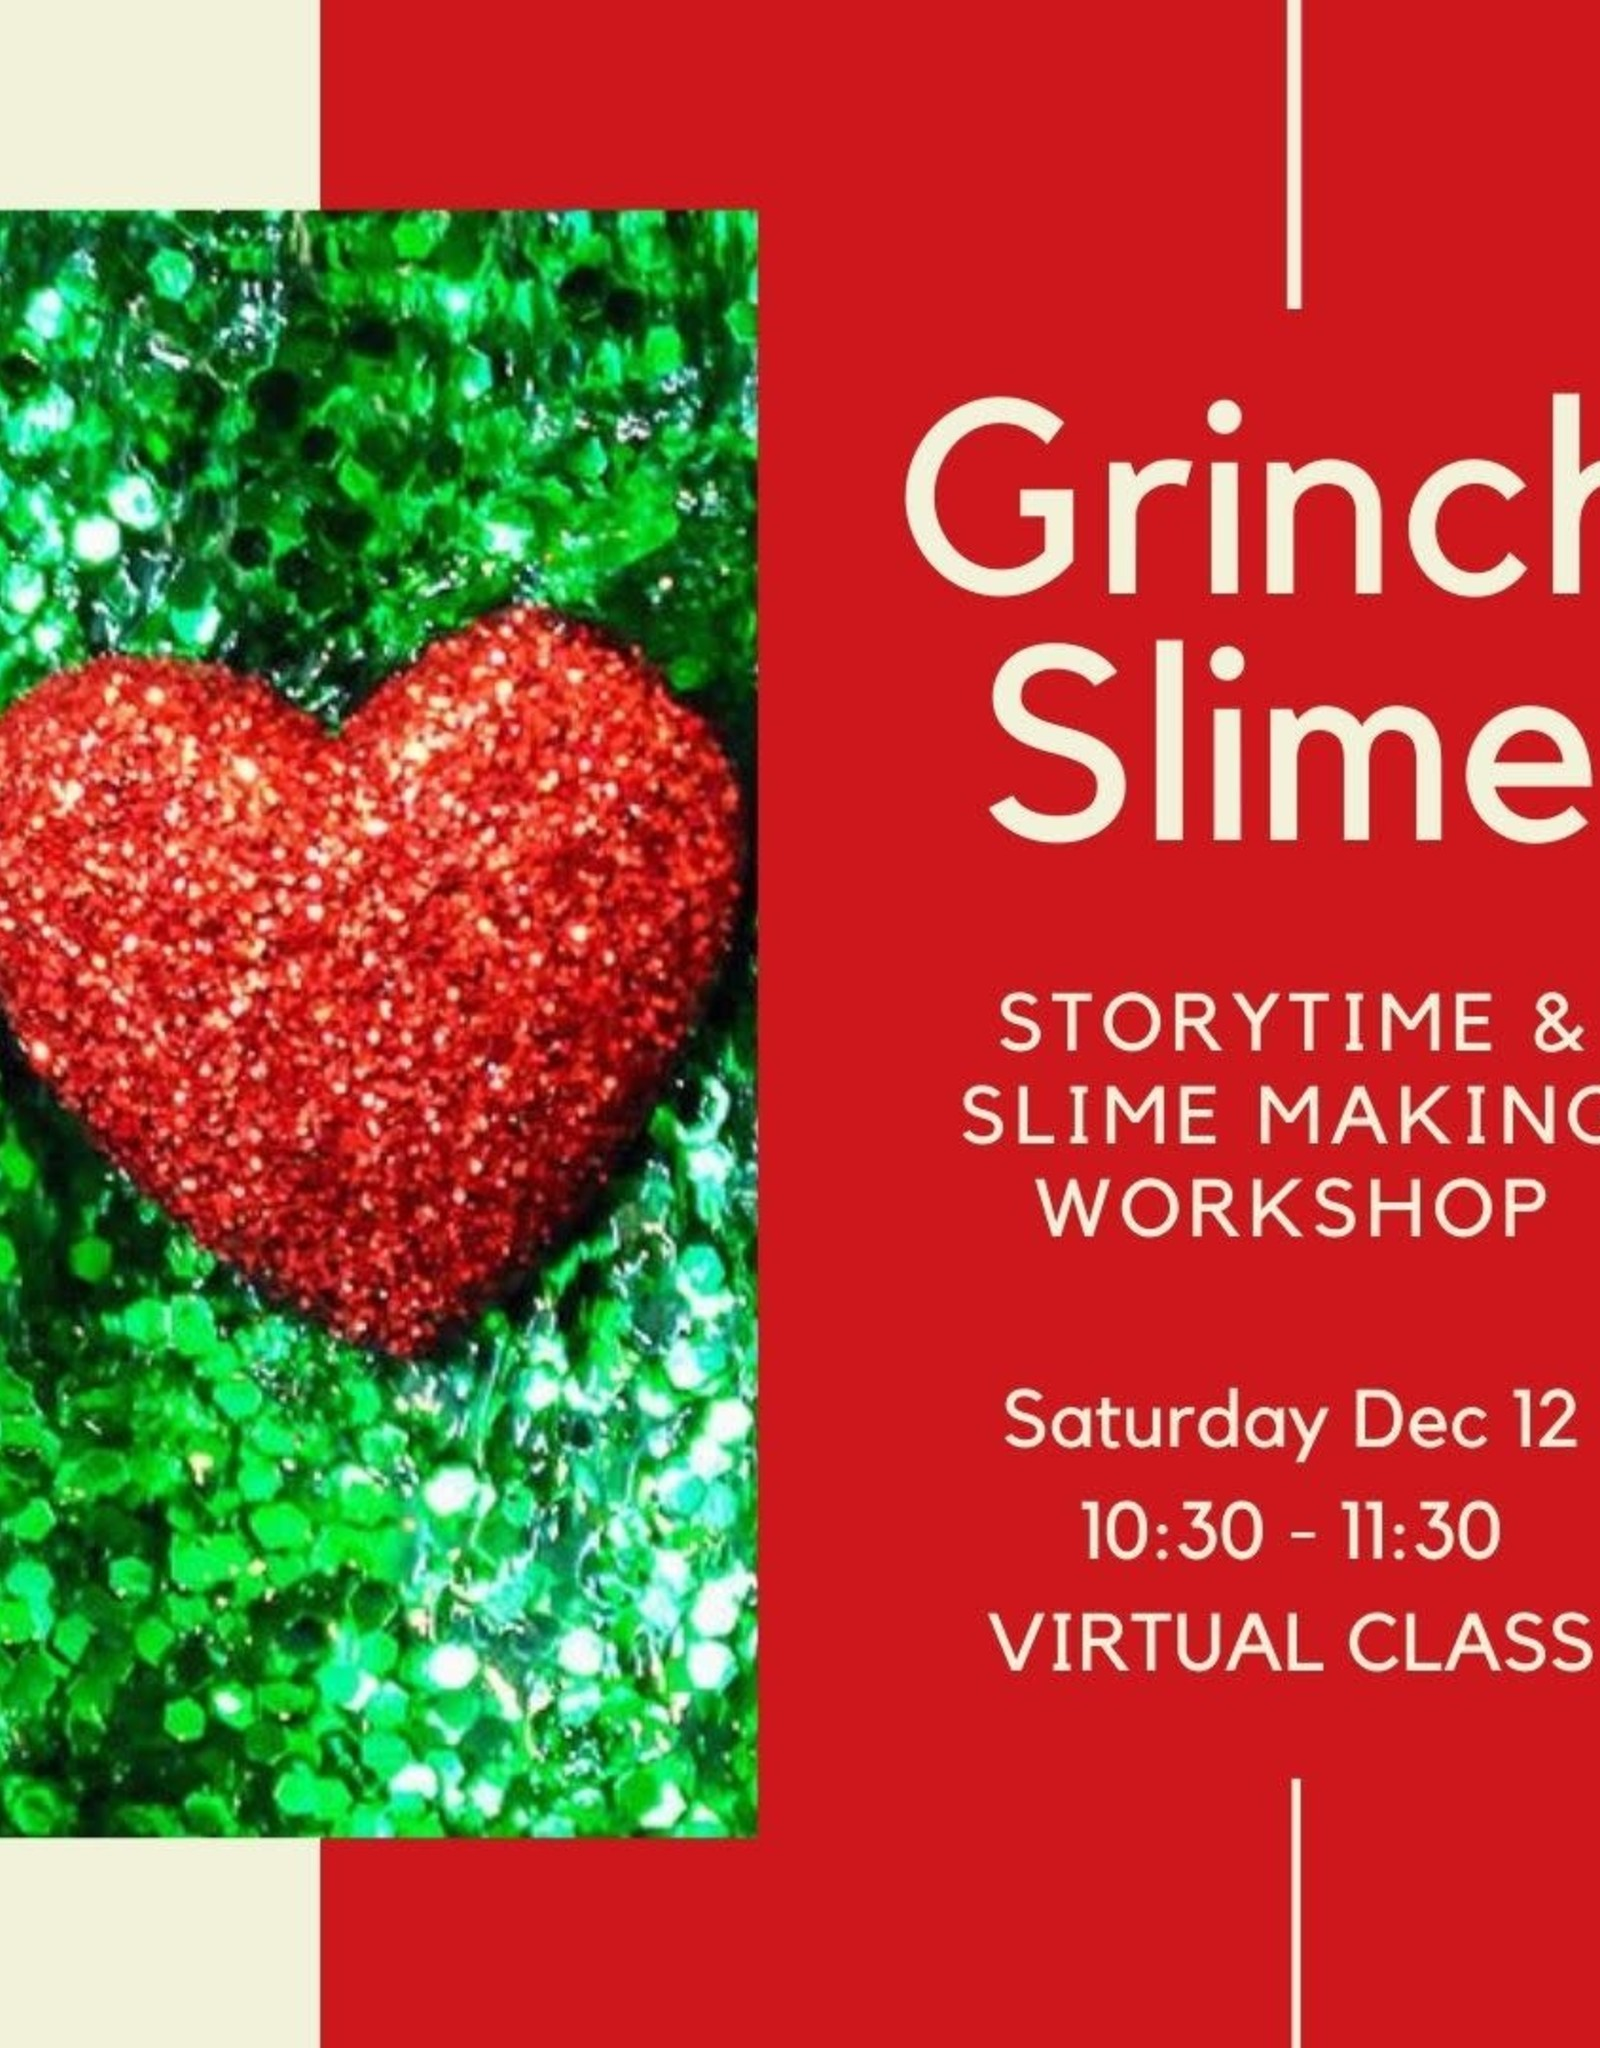 Grinch Slime Workshop - VIRTUAL - Dec 12